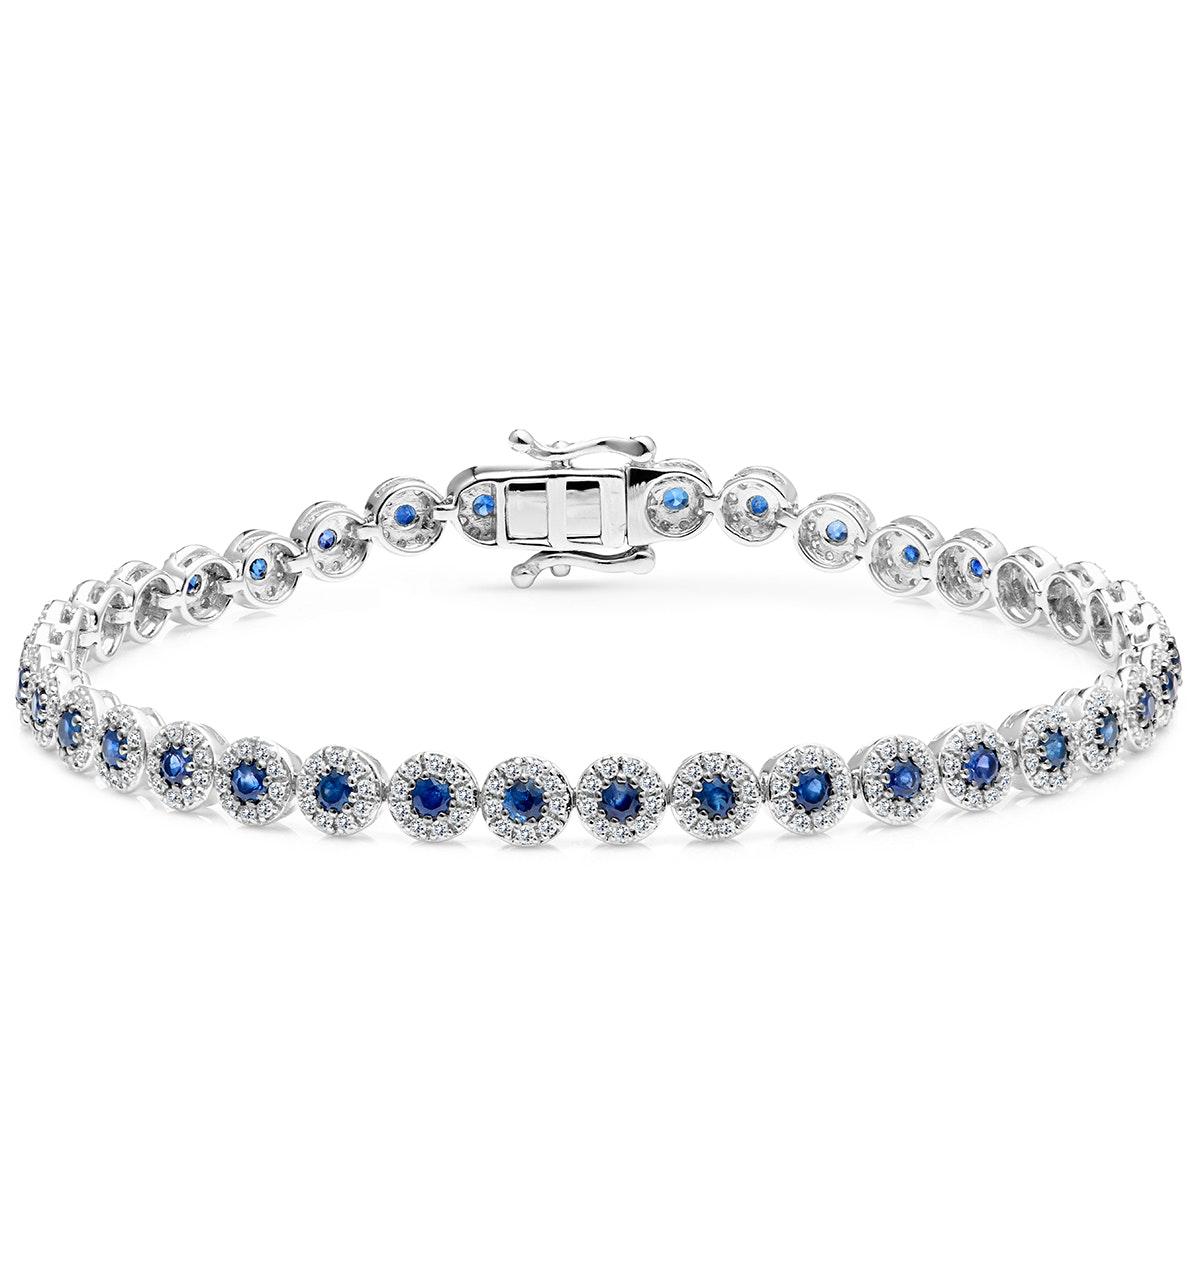 1.62ct Sapphire and 1ct Diamond Stellato Bracelet in 9K White Gold